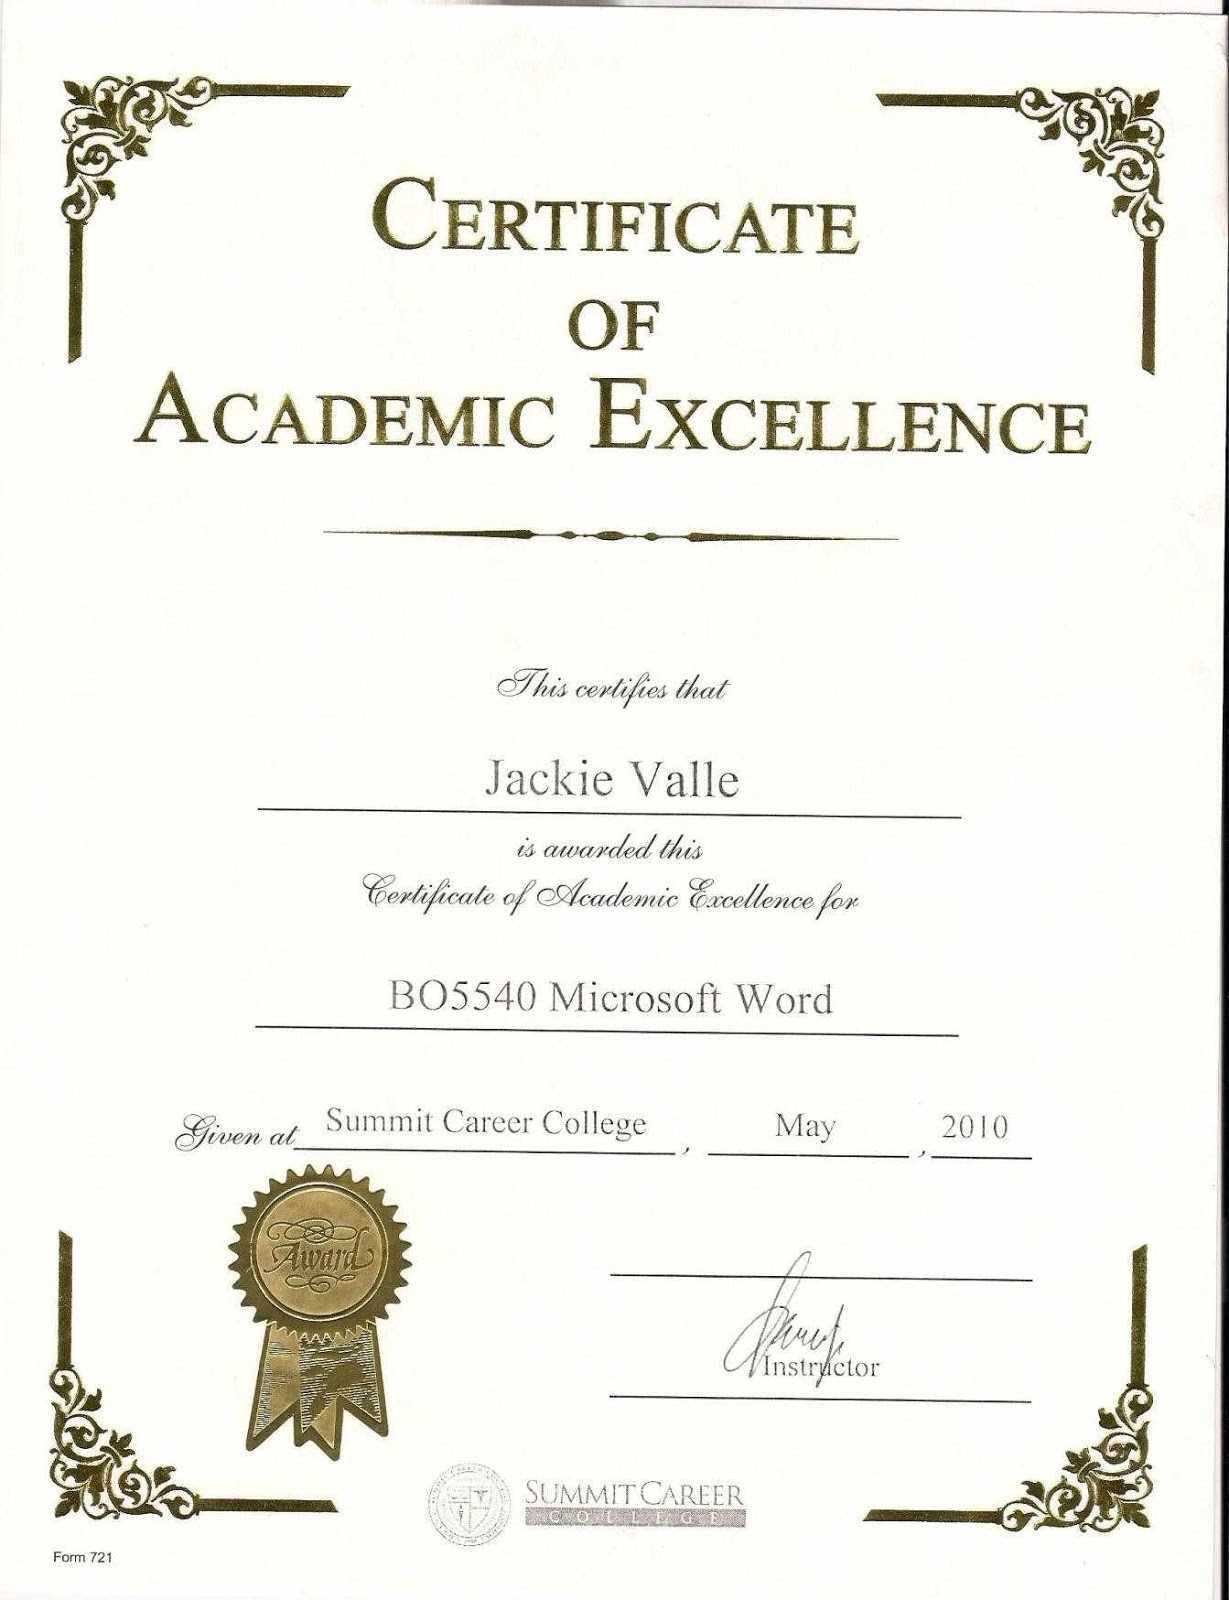 022 Template Ideas Terrific Award Certificate Word Sample in Sports Award Certificate Template Word